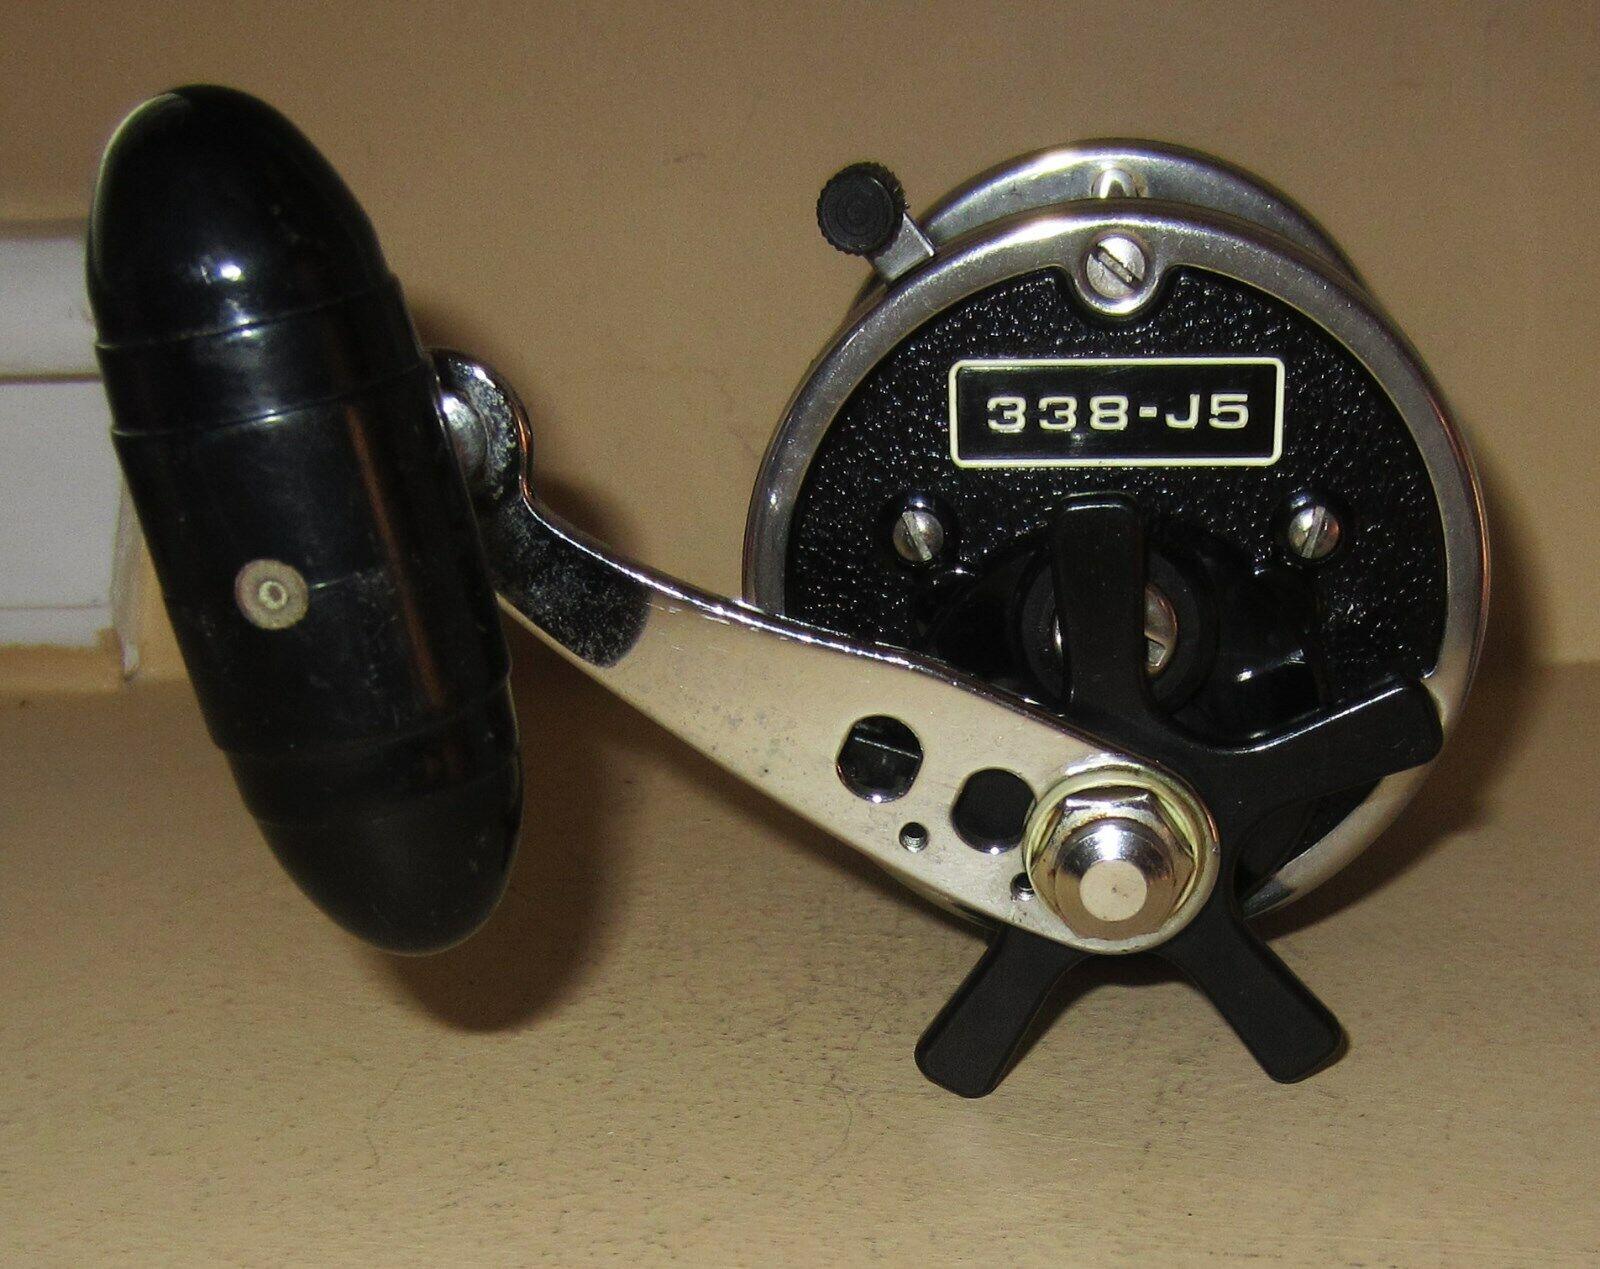 Vintage Cochel Newell convencional Reel De Pesca Modelo 338-J5